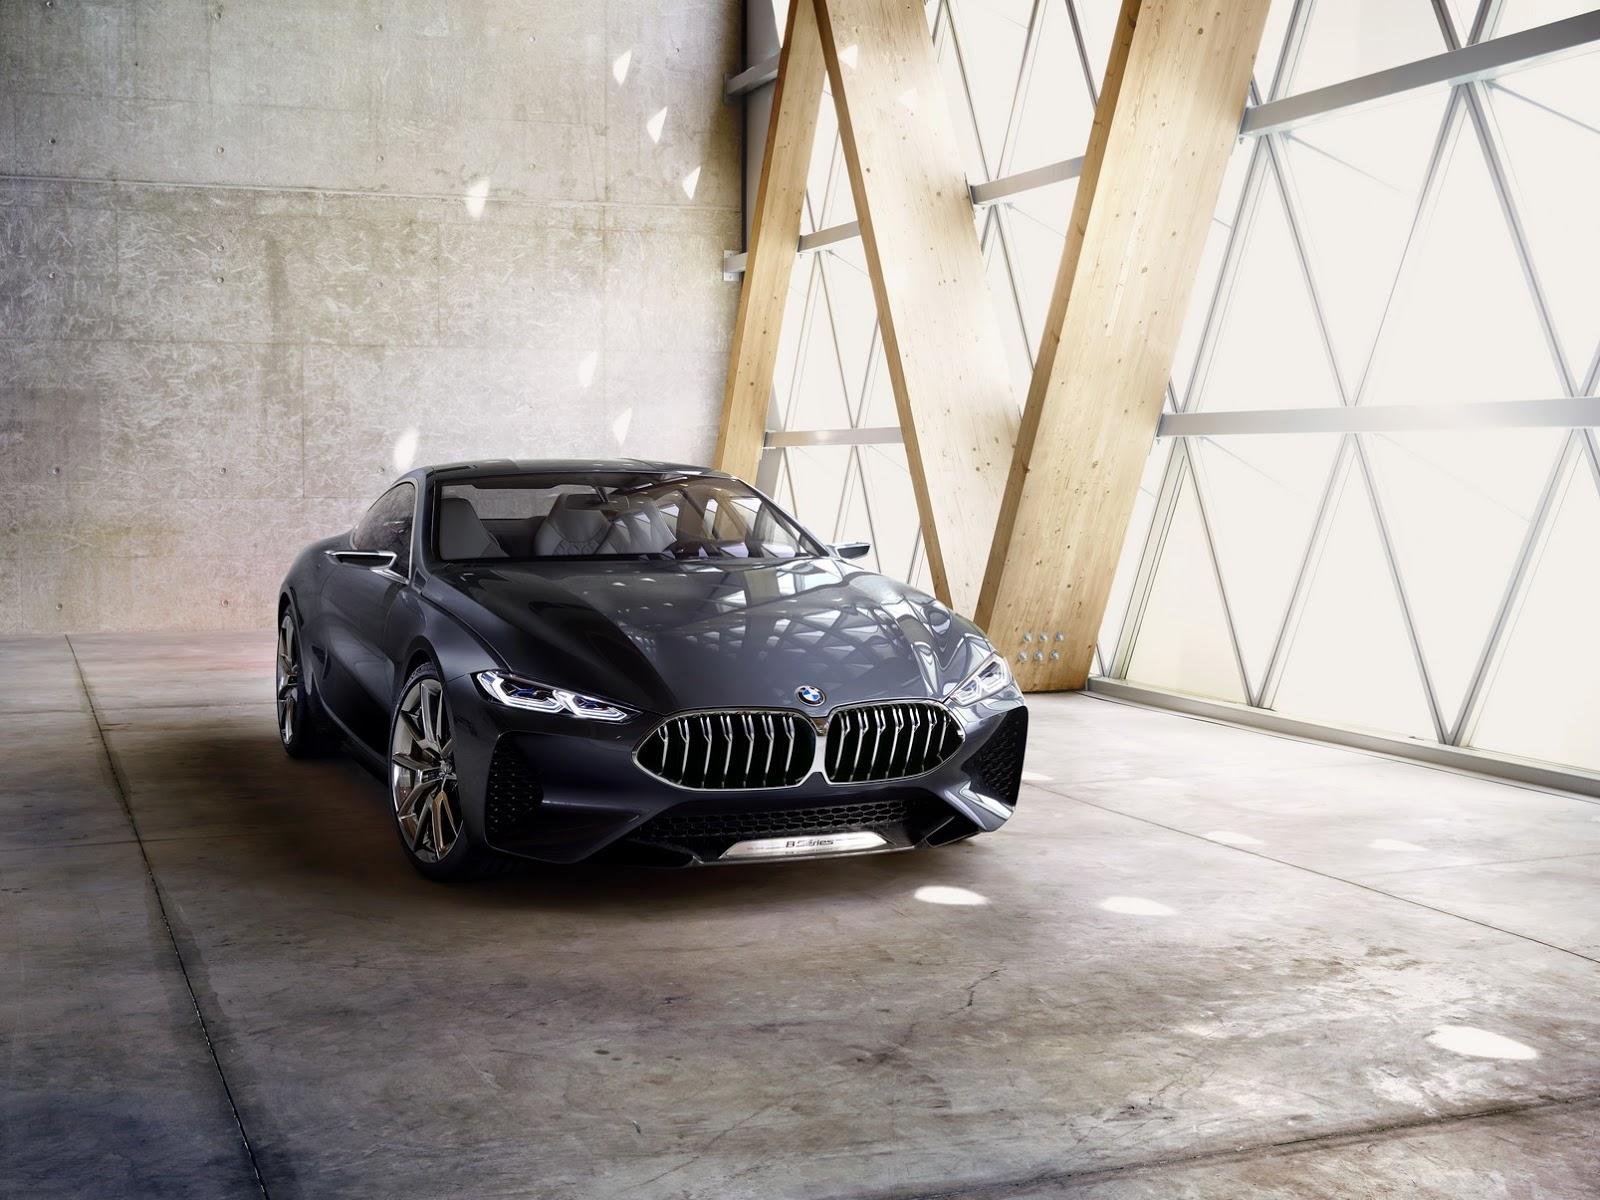 BMW-2019-8-Series-Concept-10